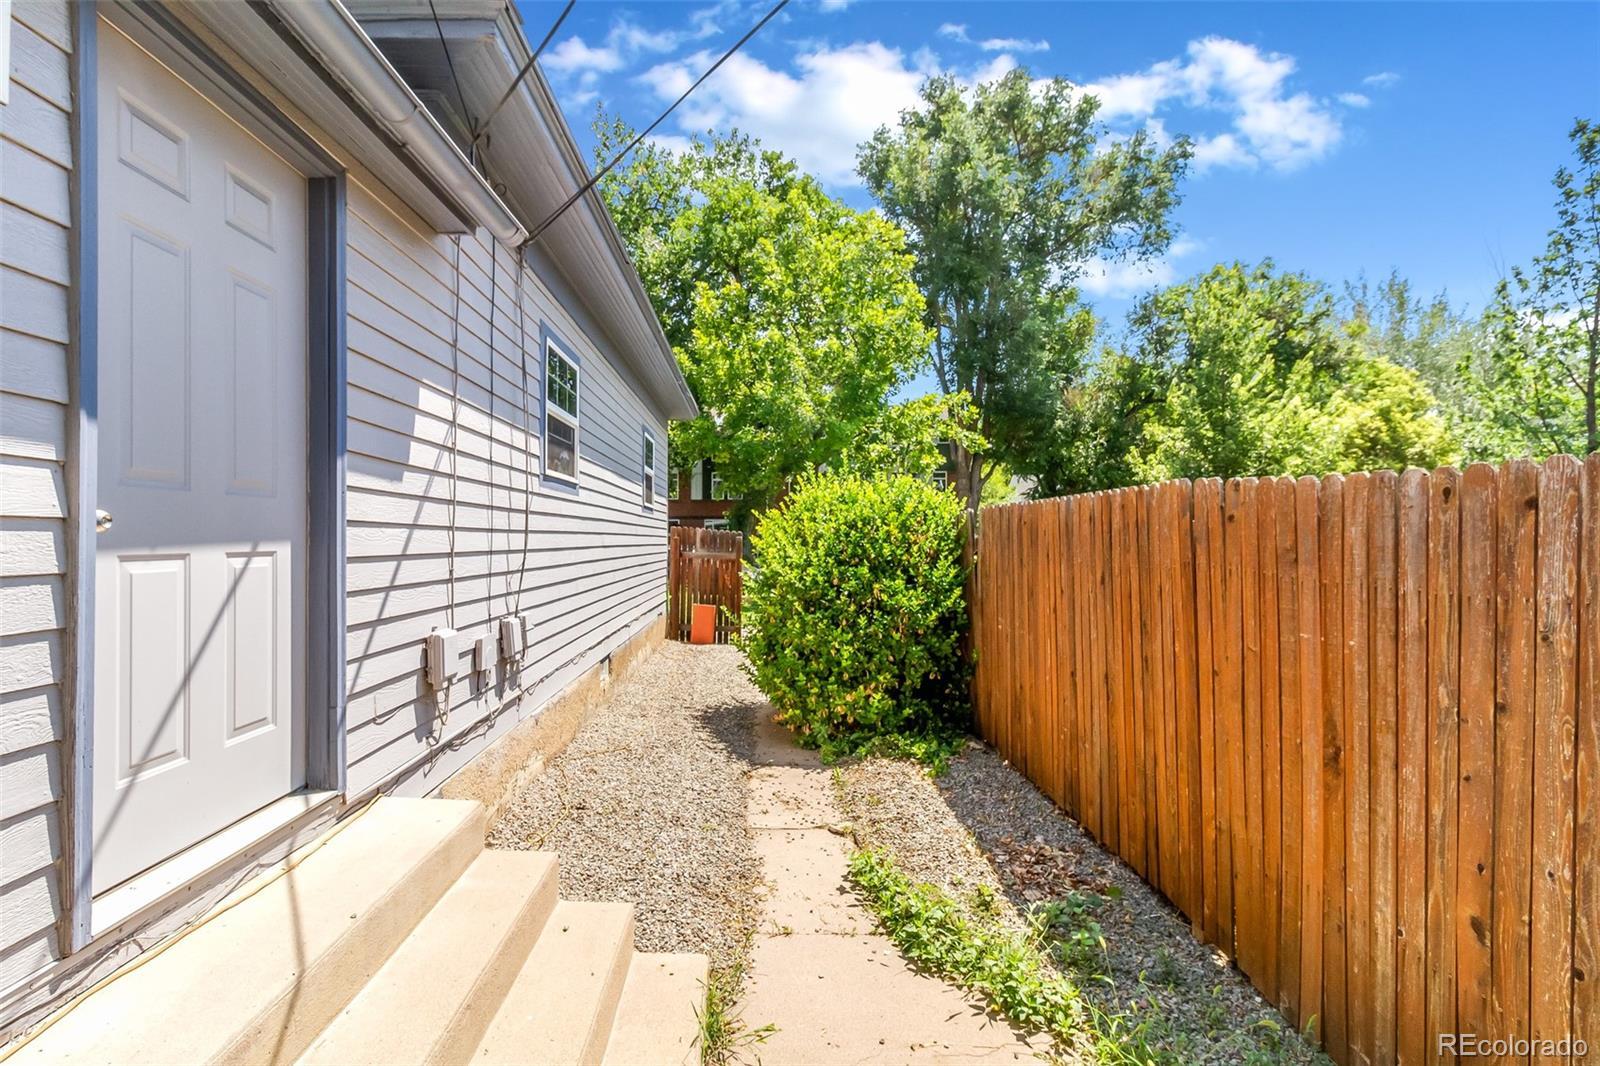 MLS# 3156813 - 24 - 947 Kimbark Street, Longmont, CO 80501